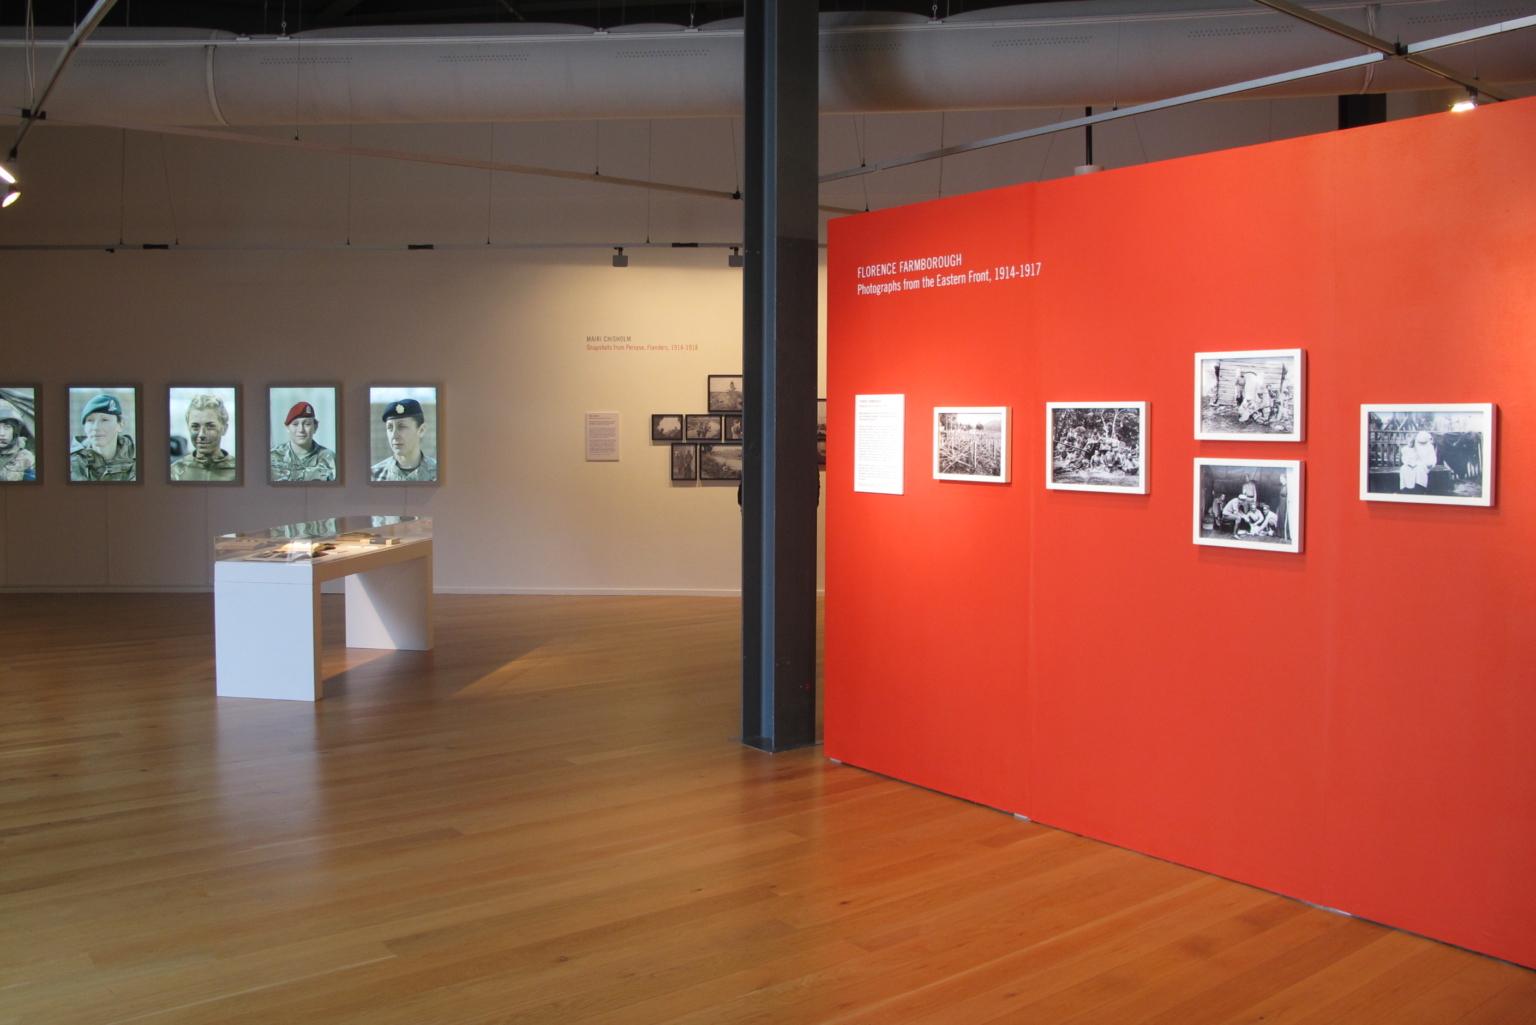 'No Man's Land', exhibition view. Courtesy: Impressions Gallery, Bradford